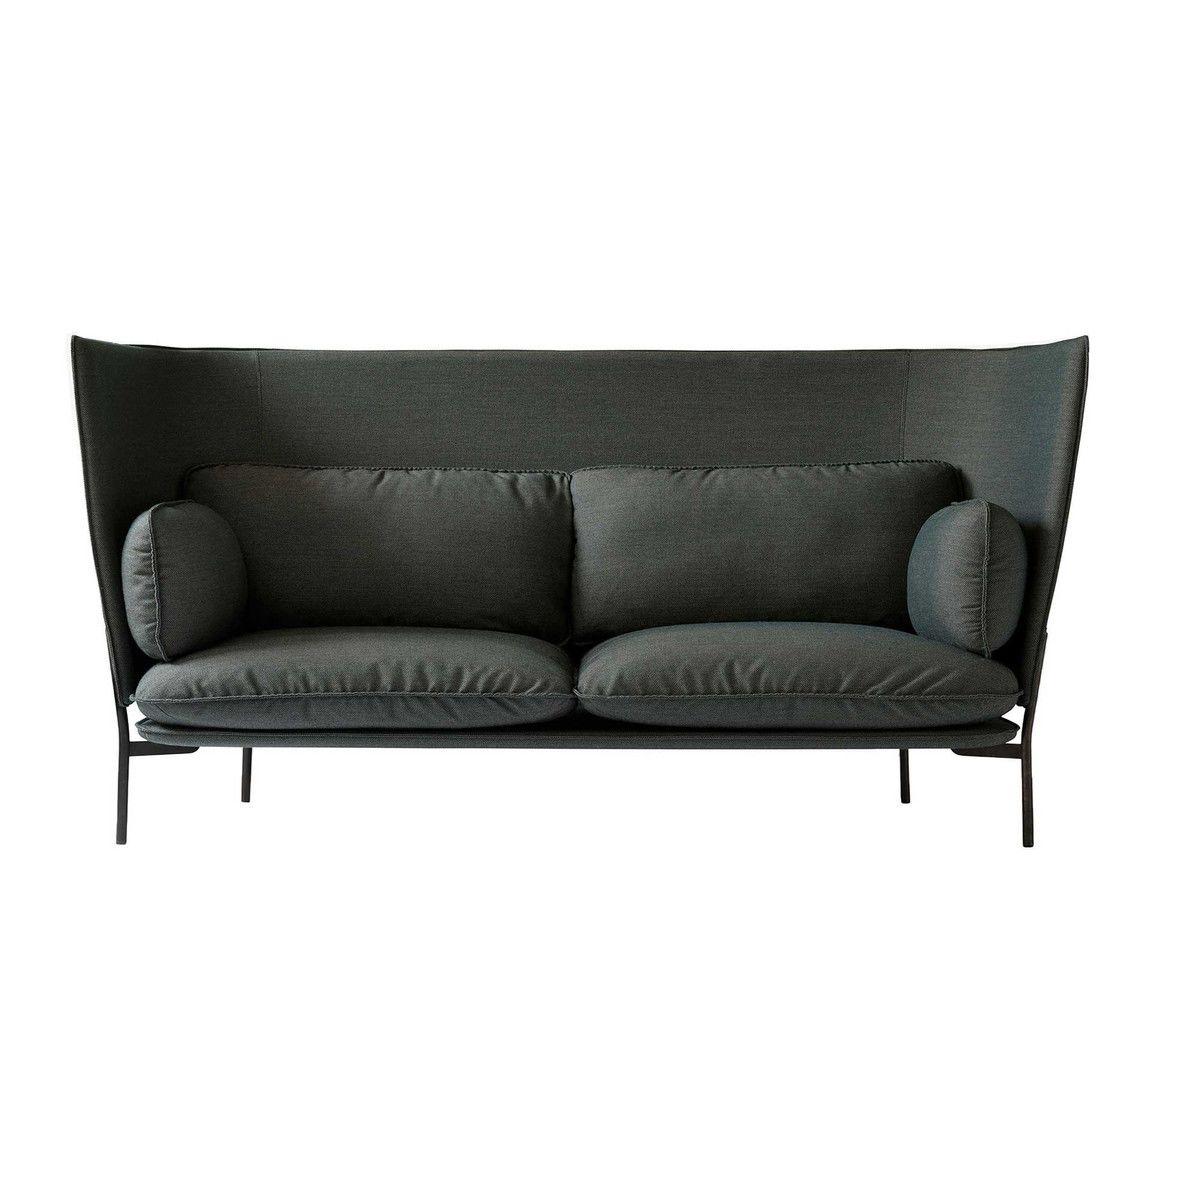 cloud high back ln7 sofa with high back andtradition. Black Bedroom Furniture Sets. Home Design Ideas